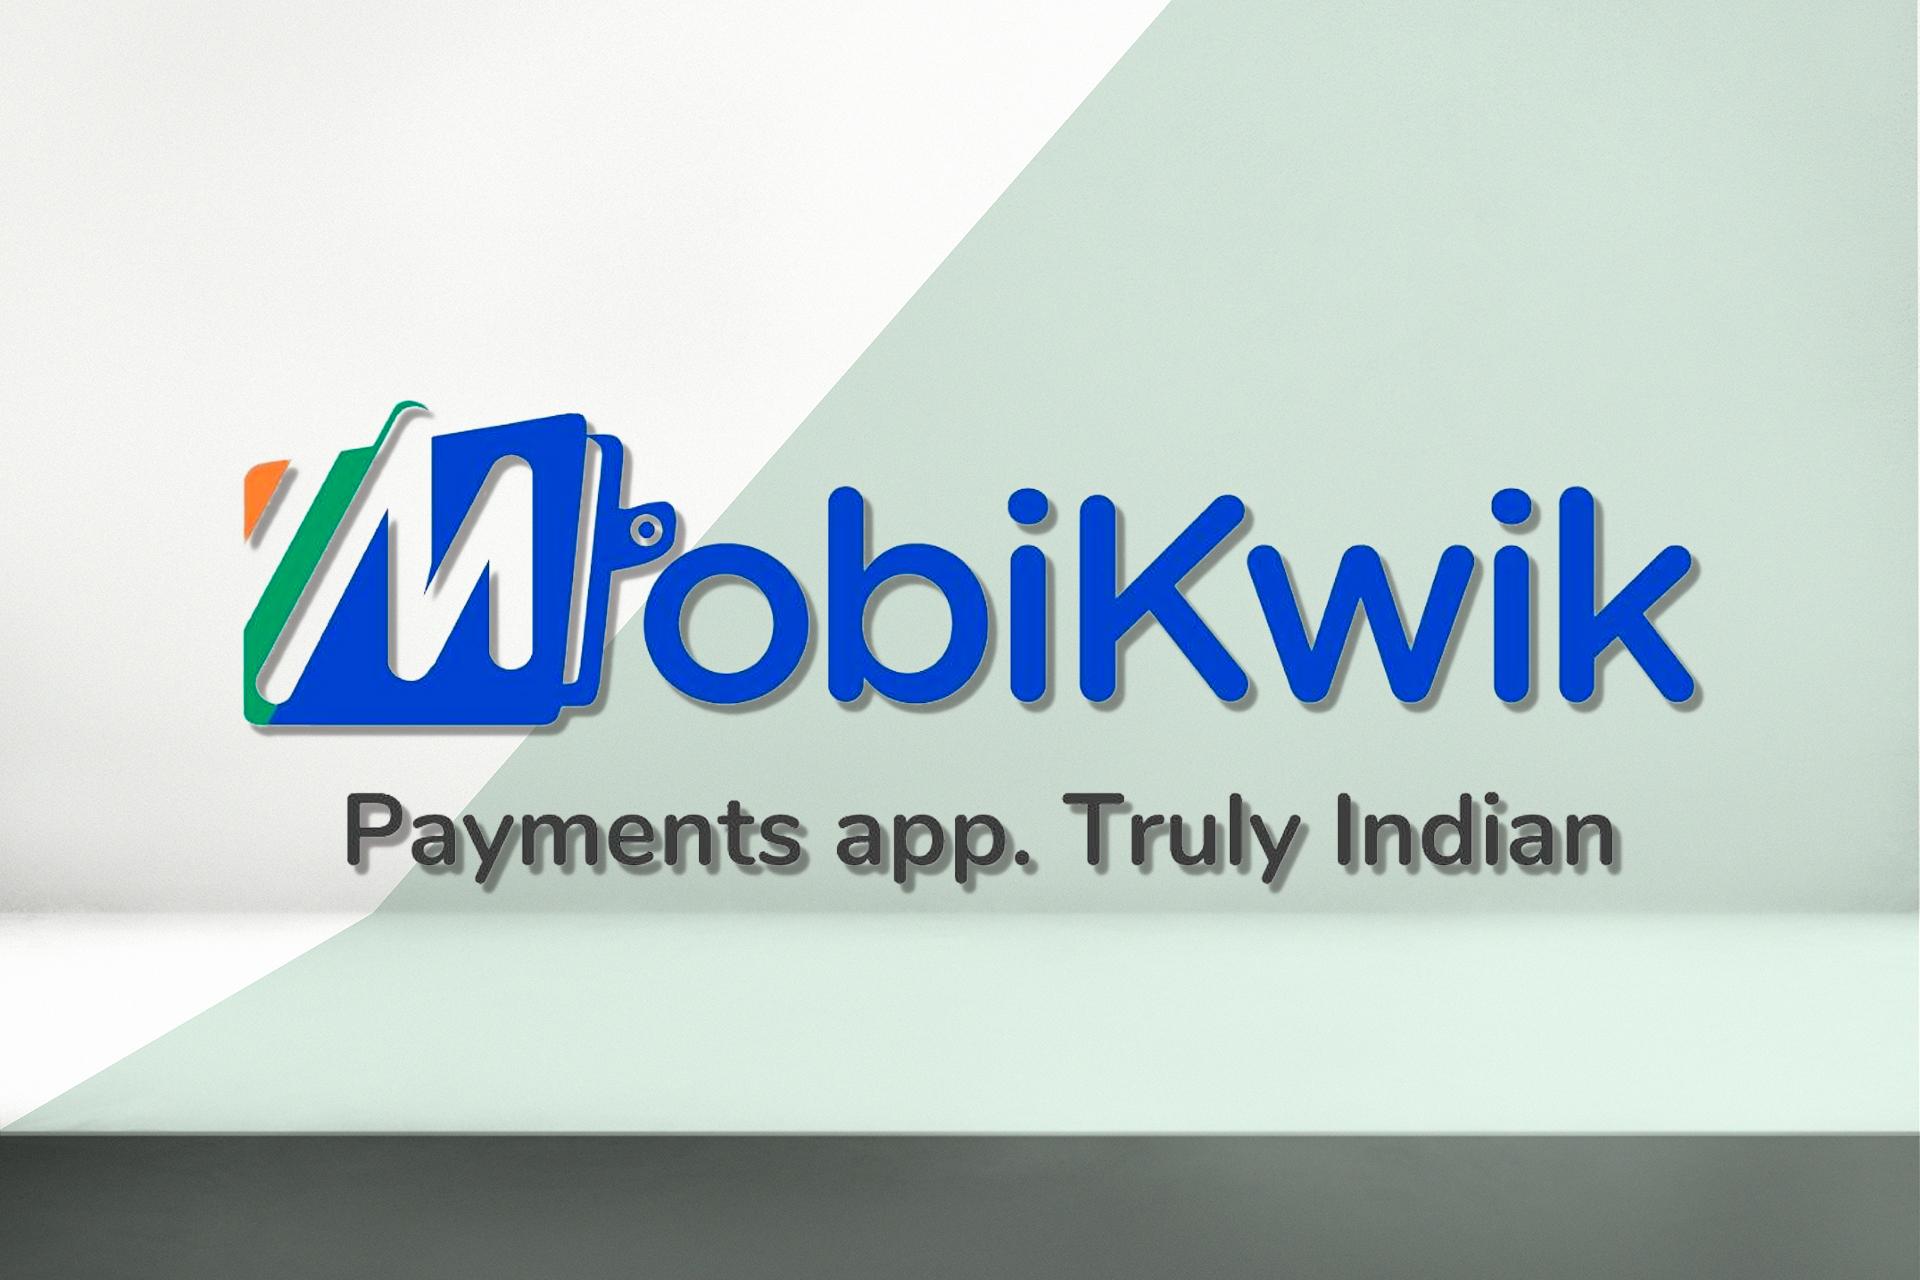 Mobikwik Logo on Green-White background